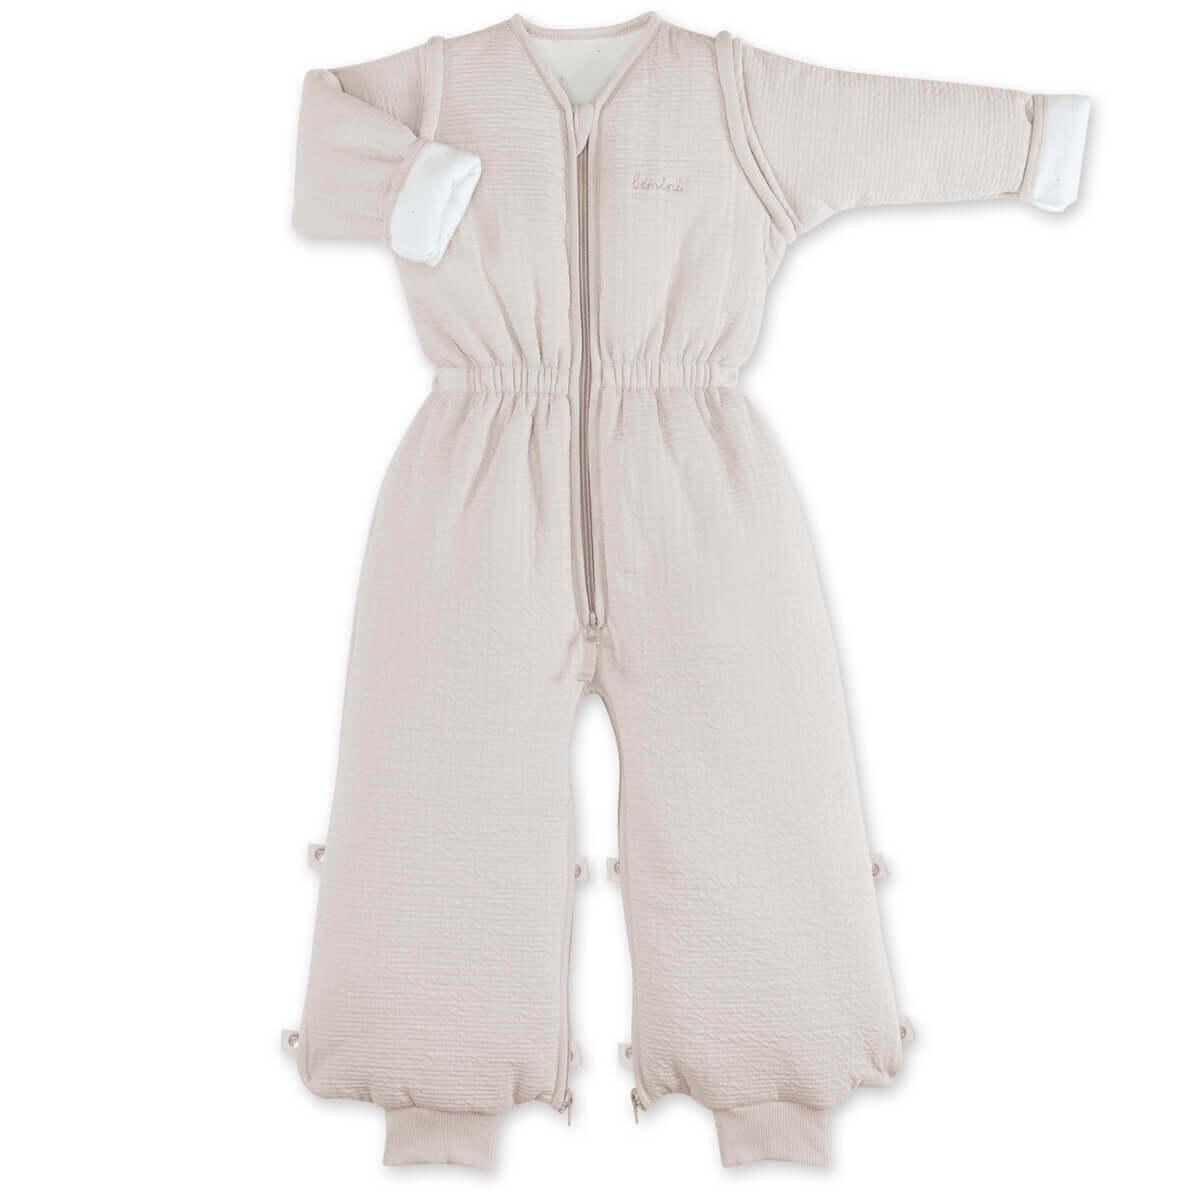 Surpyjama Enfants avec Jambes Coton Bio Hosenmax Gigoteuse Hiver comme /Ét/é Gigoteuse A Pied Taille 56//58 cm avec Motif Renard